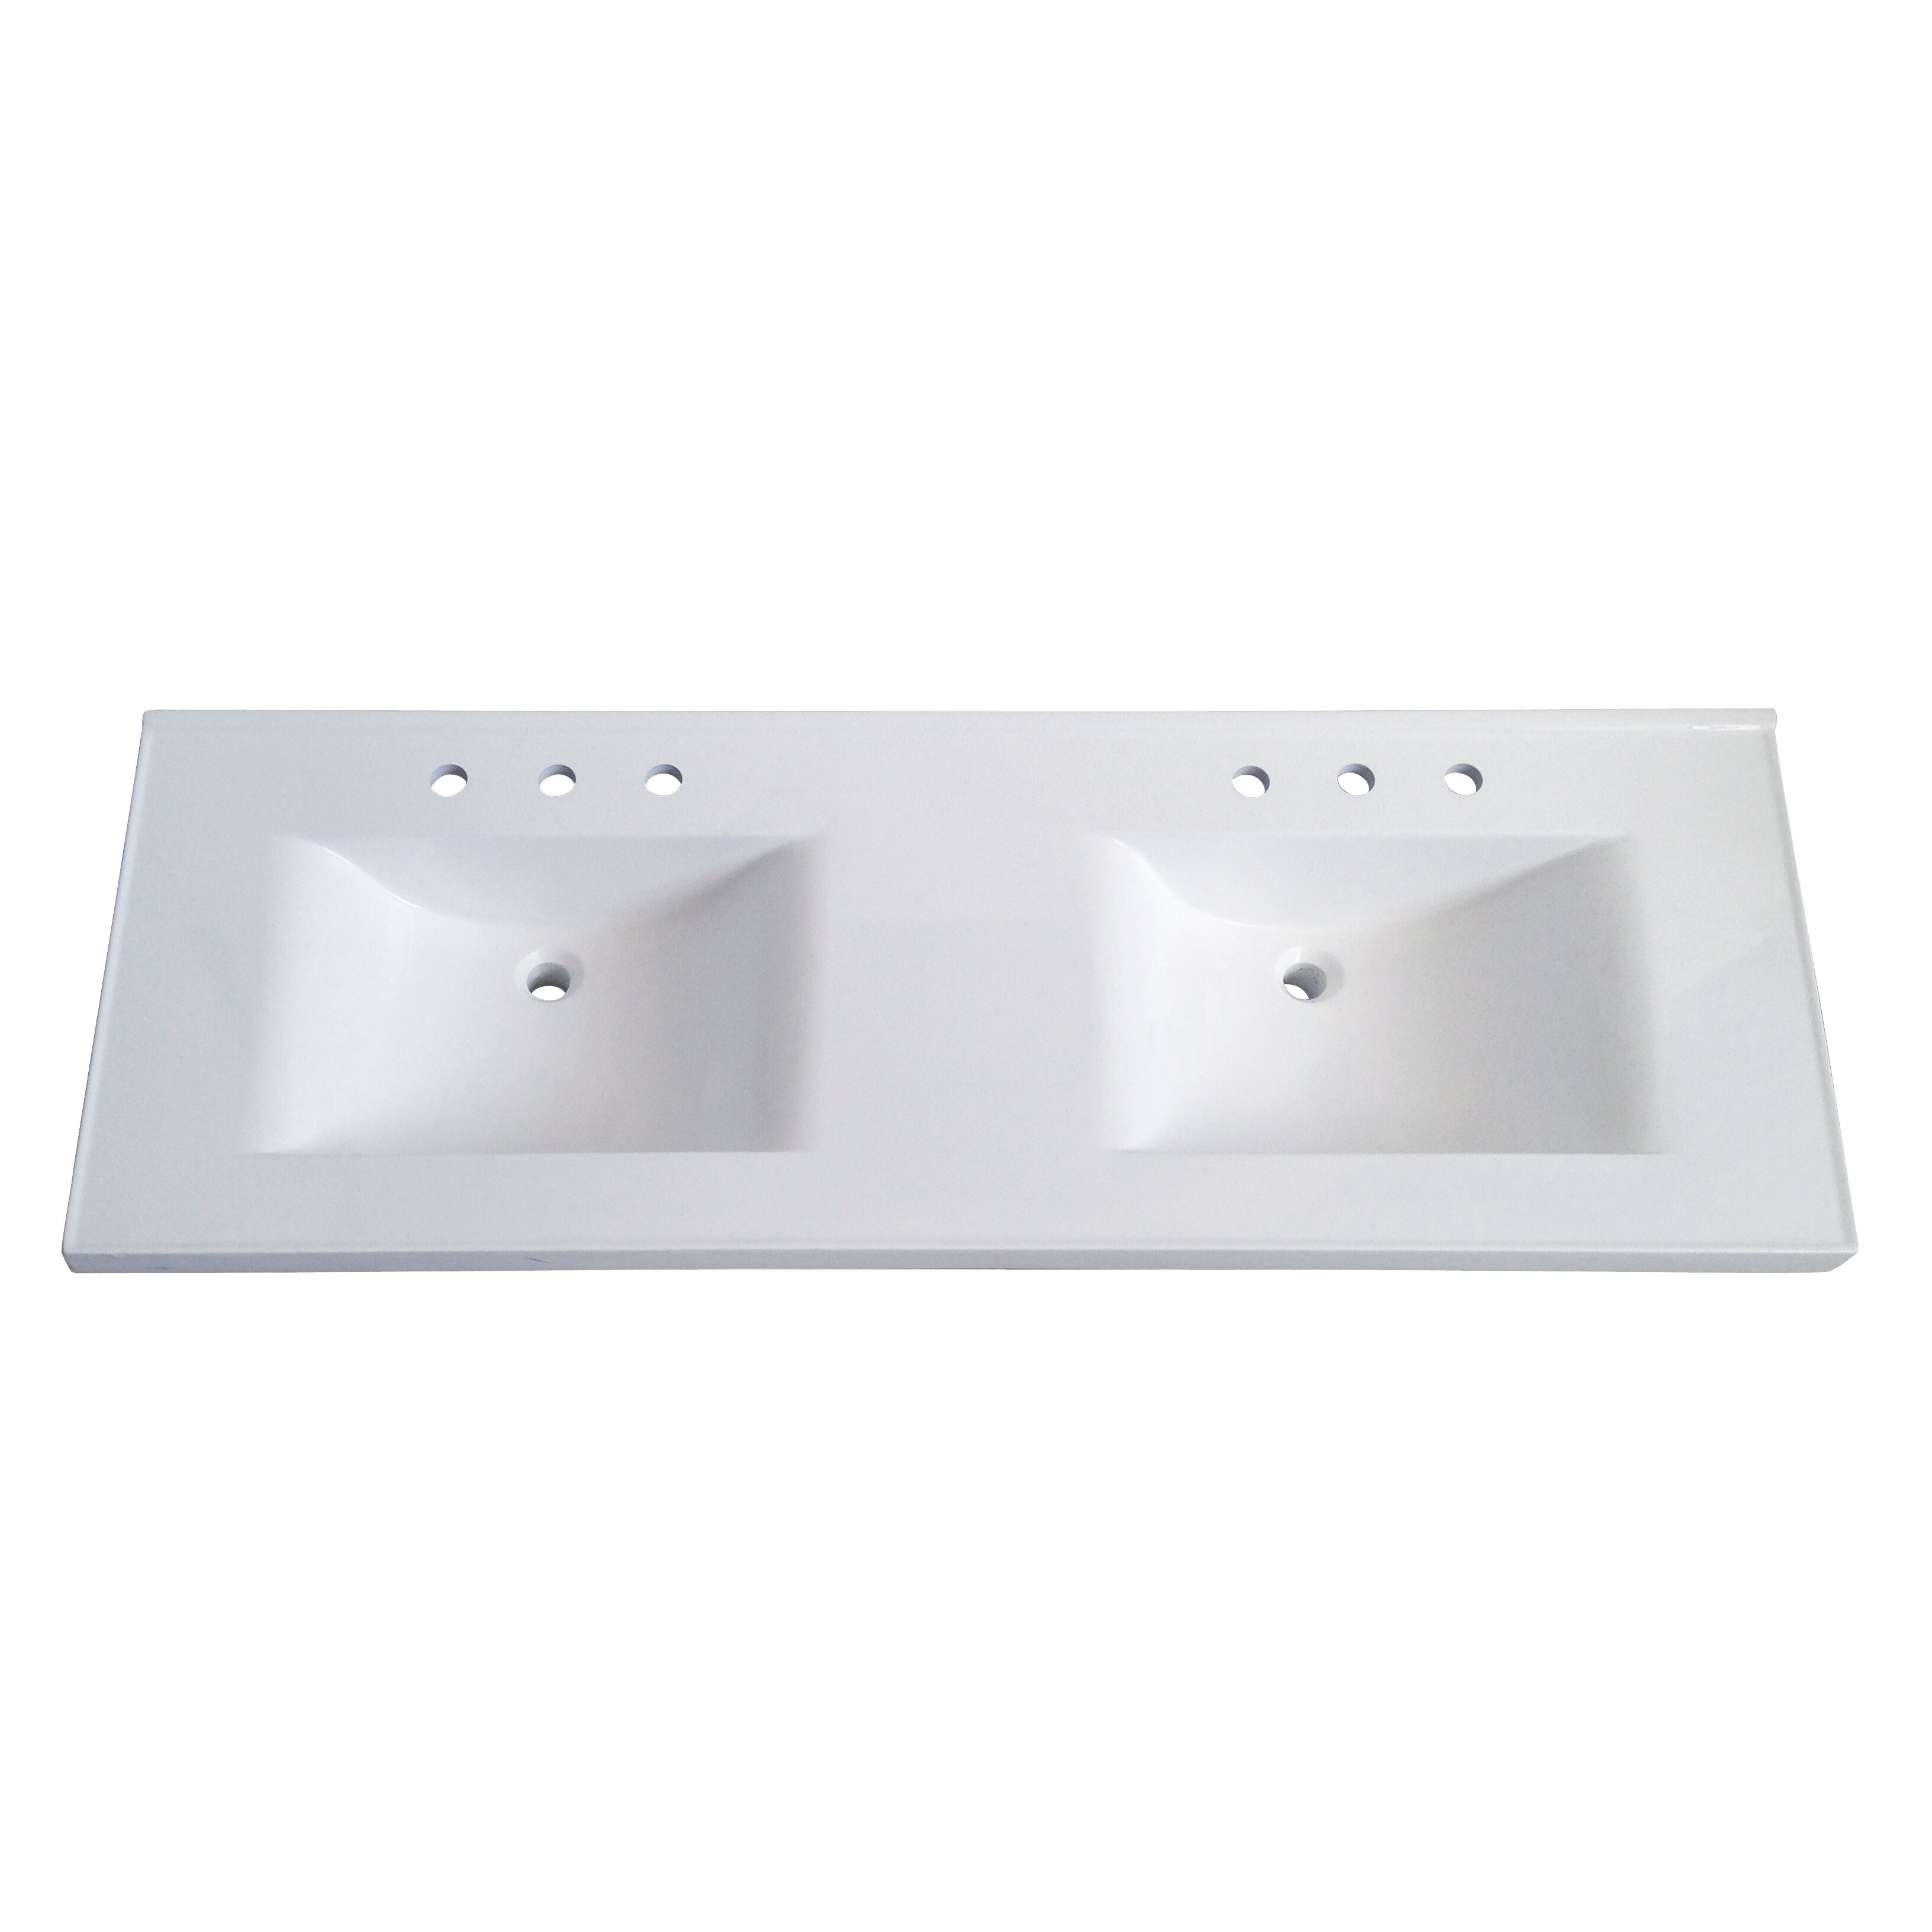 Sagehill premier 61 cultured marble vanity top reviews wayfair - Bathroom vanity tops cultured marble ...